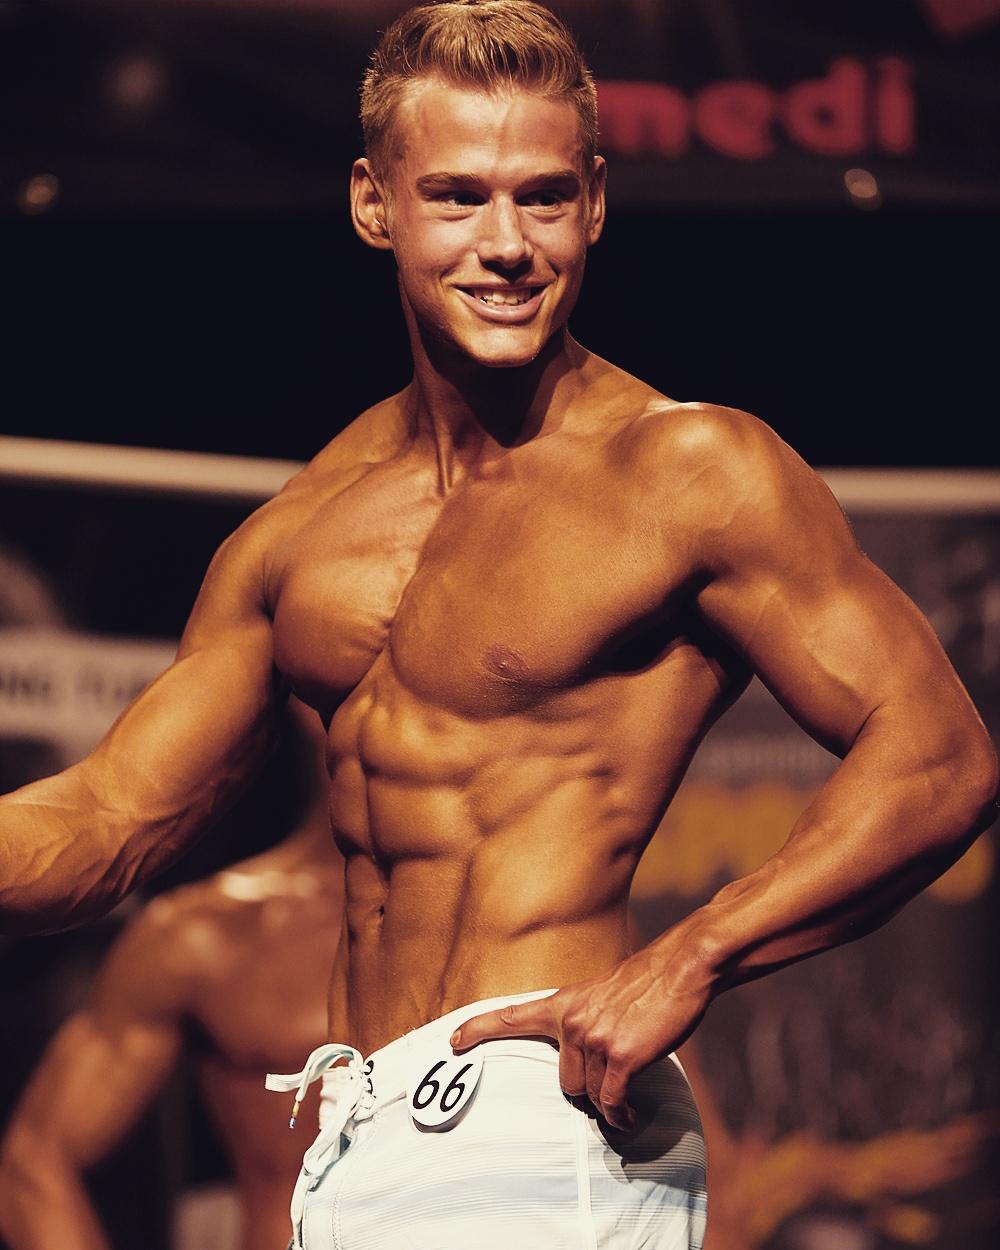 Alexander Schumacher Wettkampf